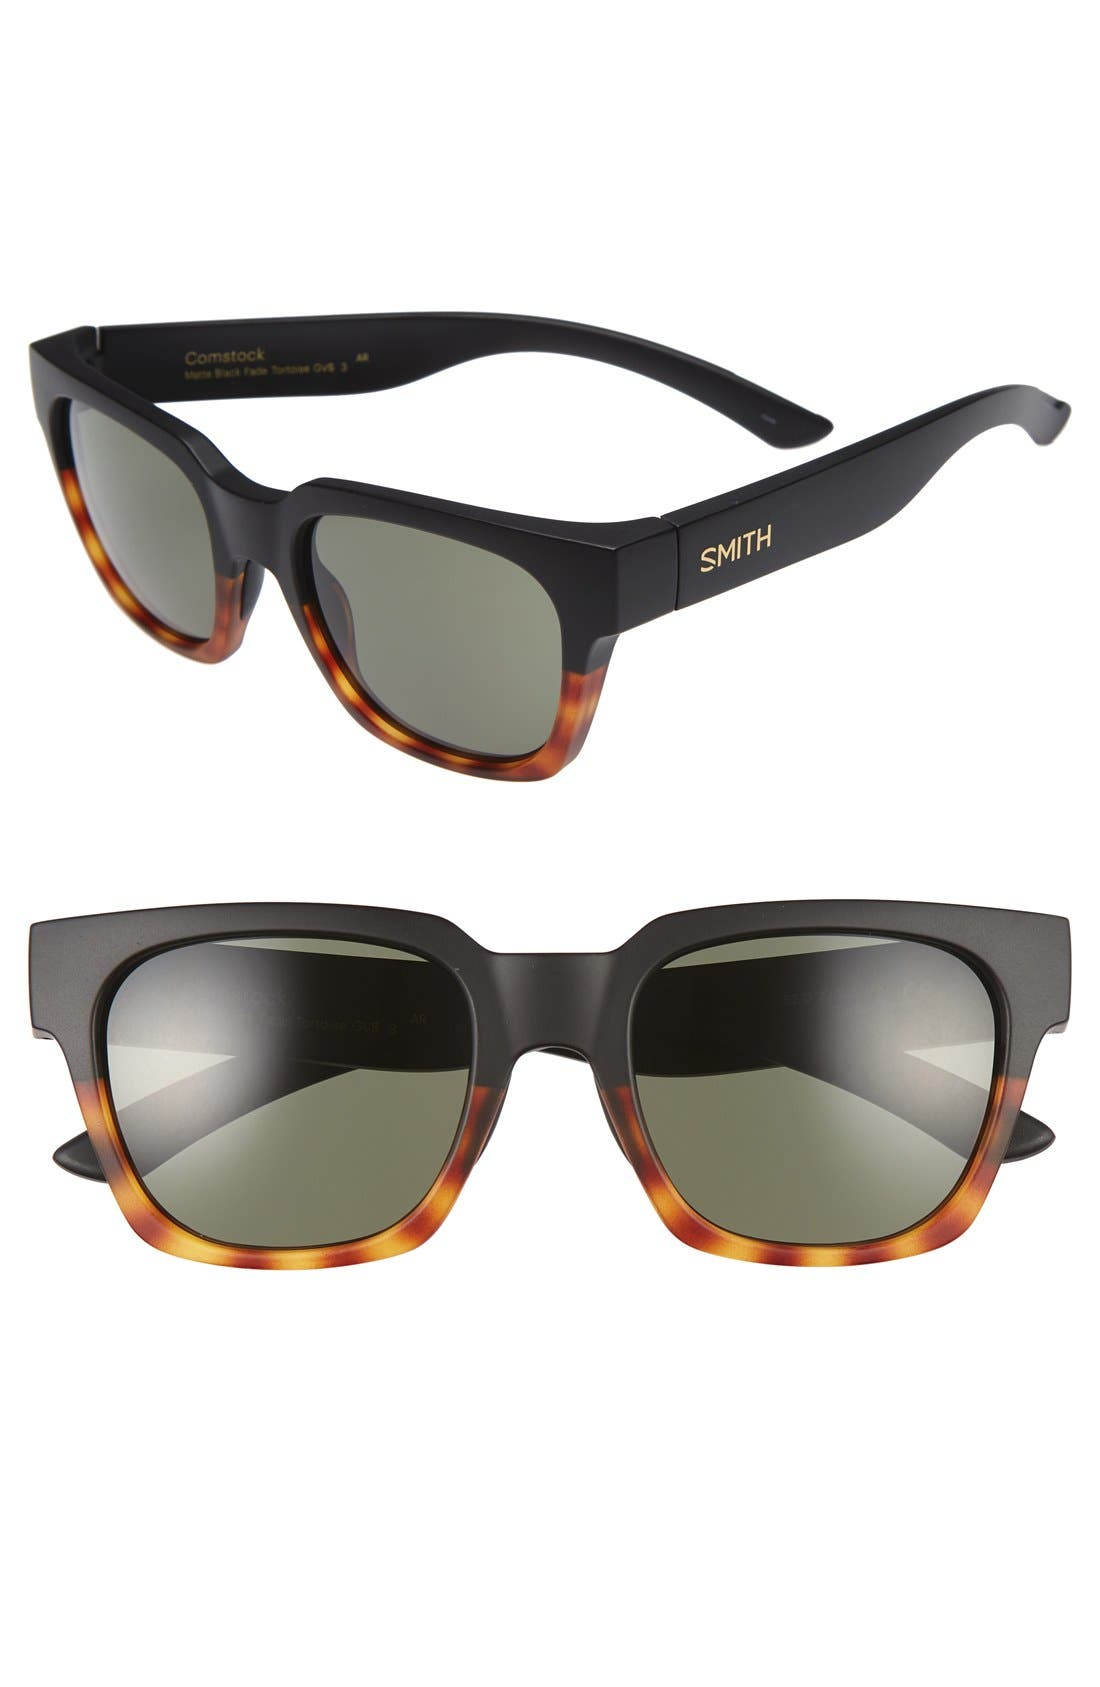 SMITH Comstock 51mm Polarized Sunglasses